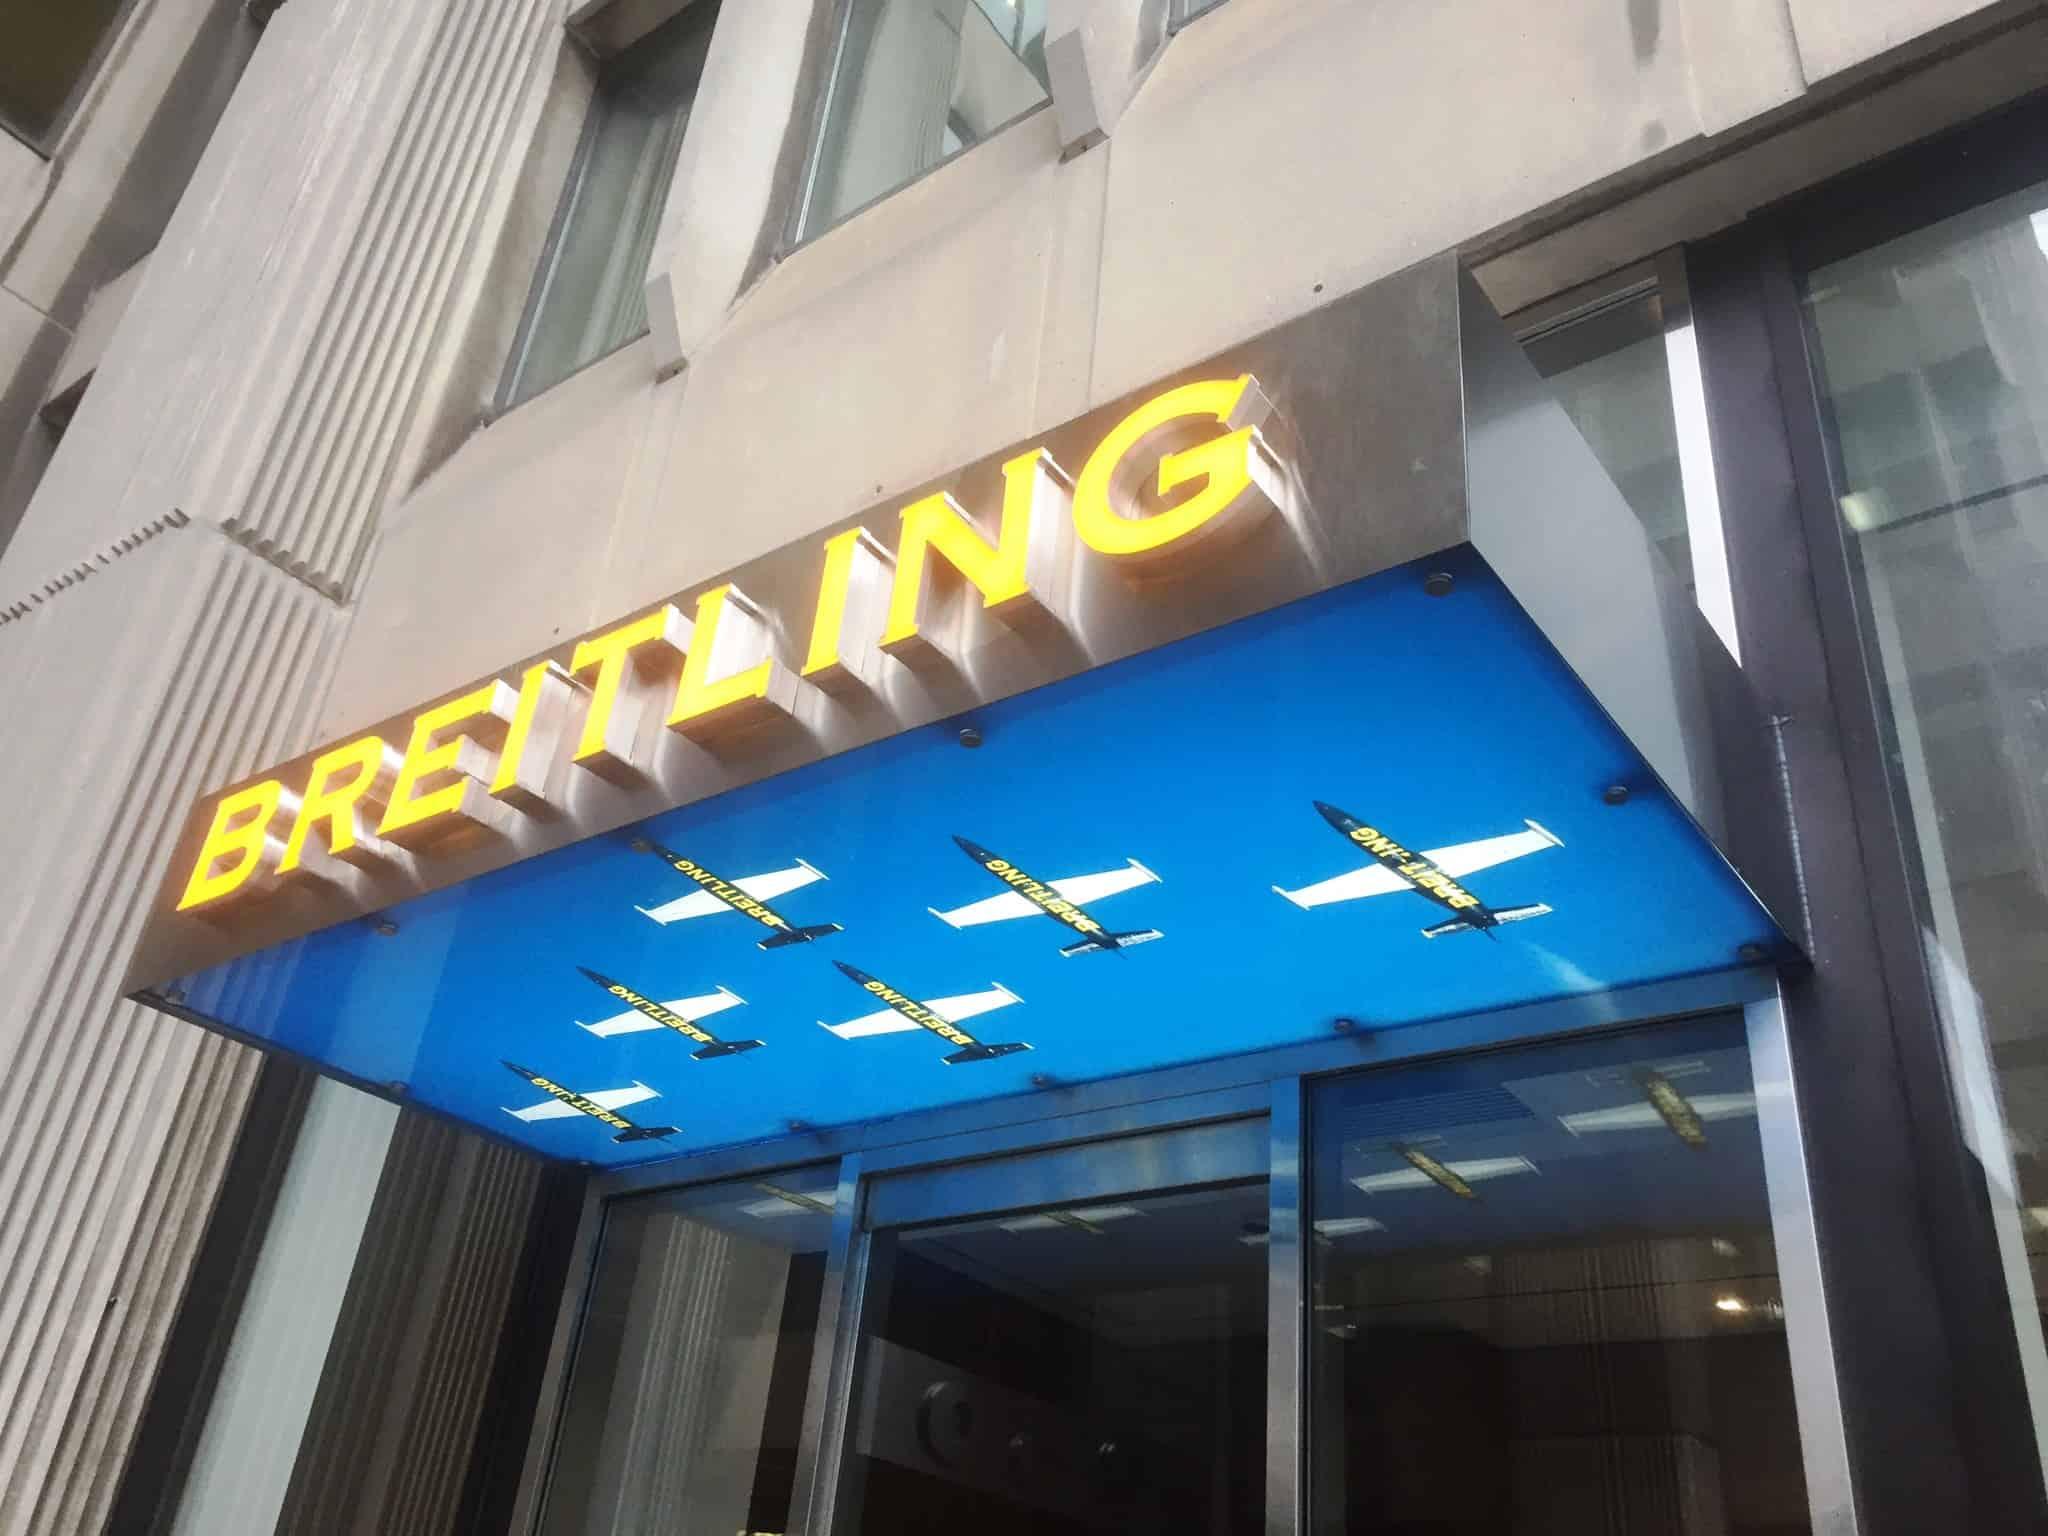 Breitling - New Sign Canopy - Bloor Street Toronto 2